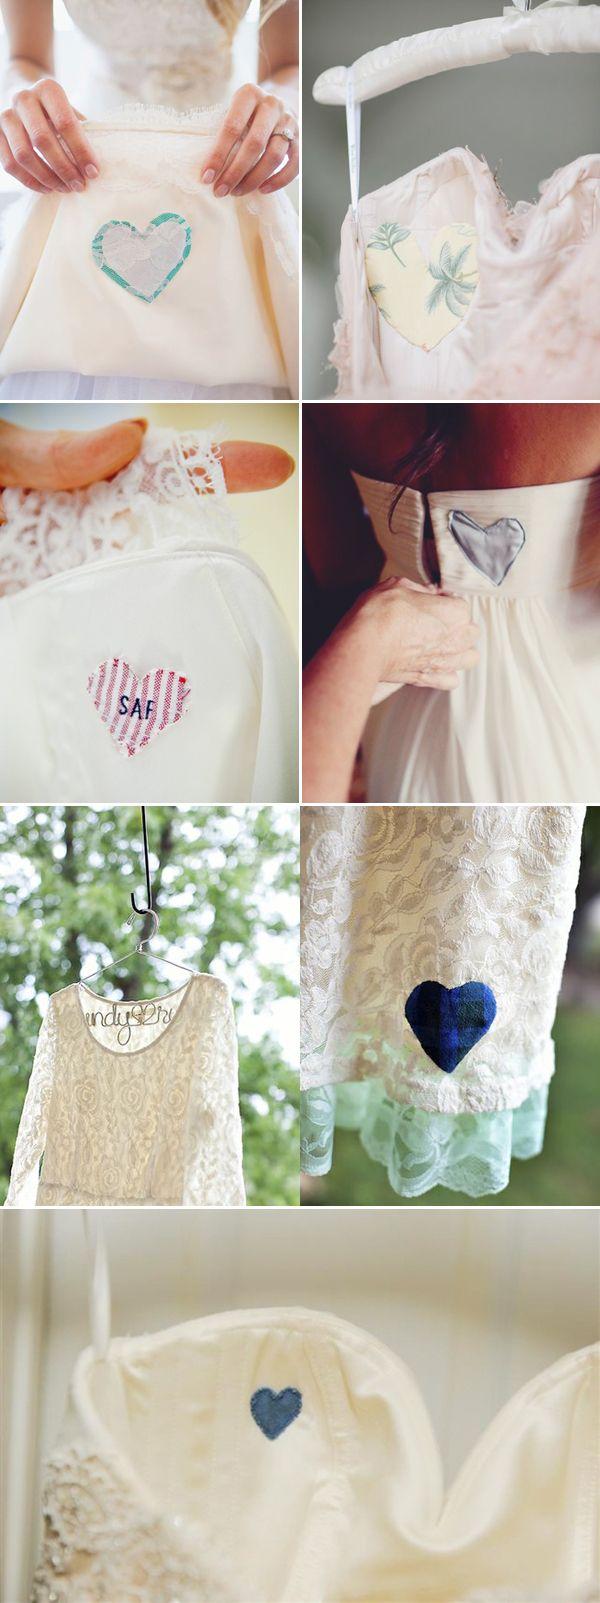 best wedding images on pinterest engagement rings engagements